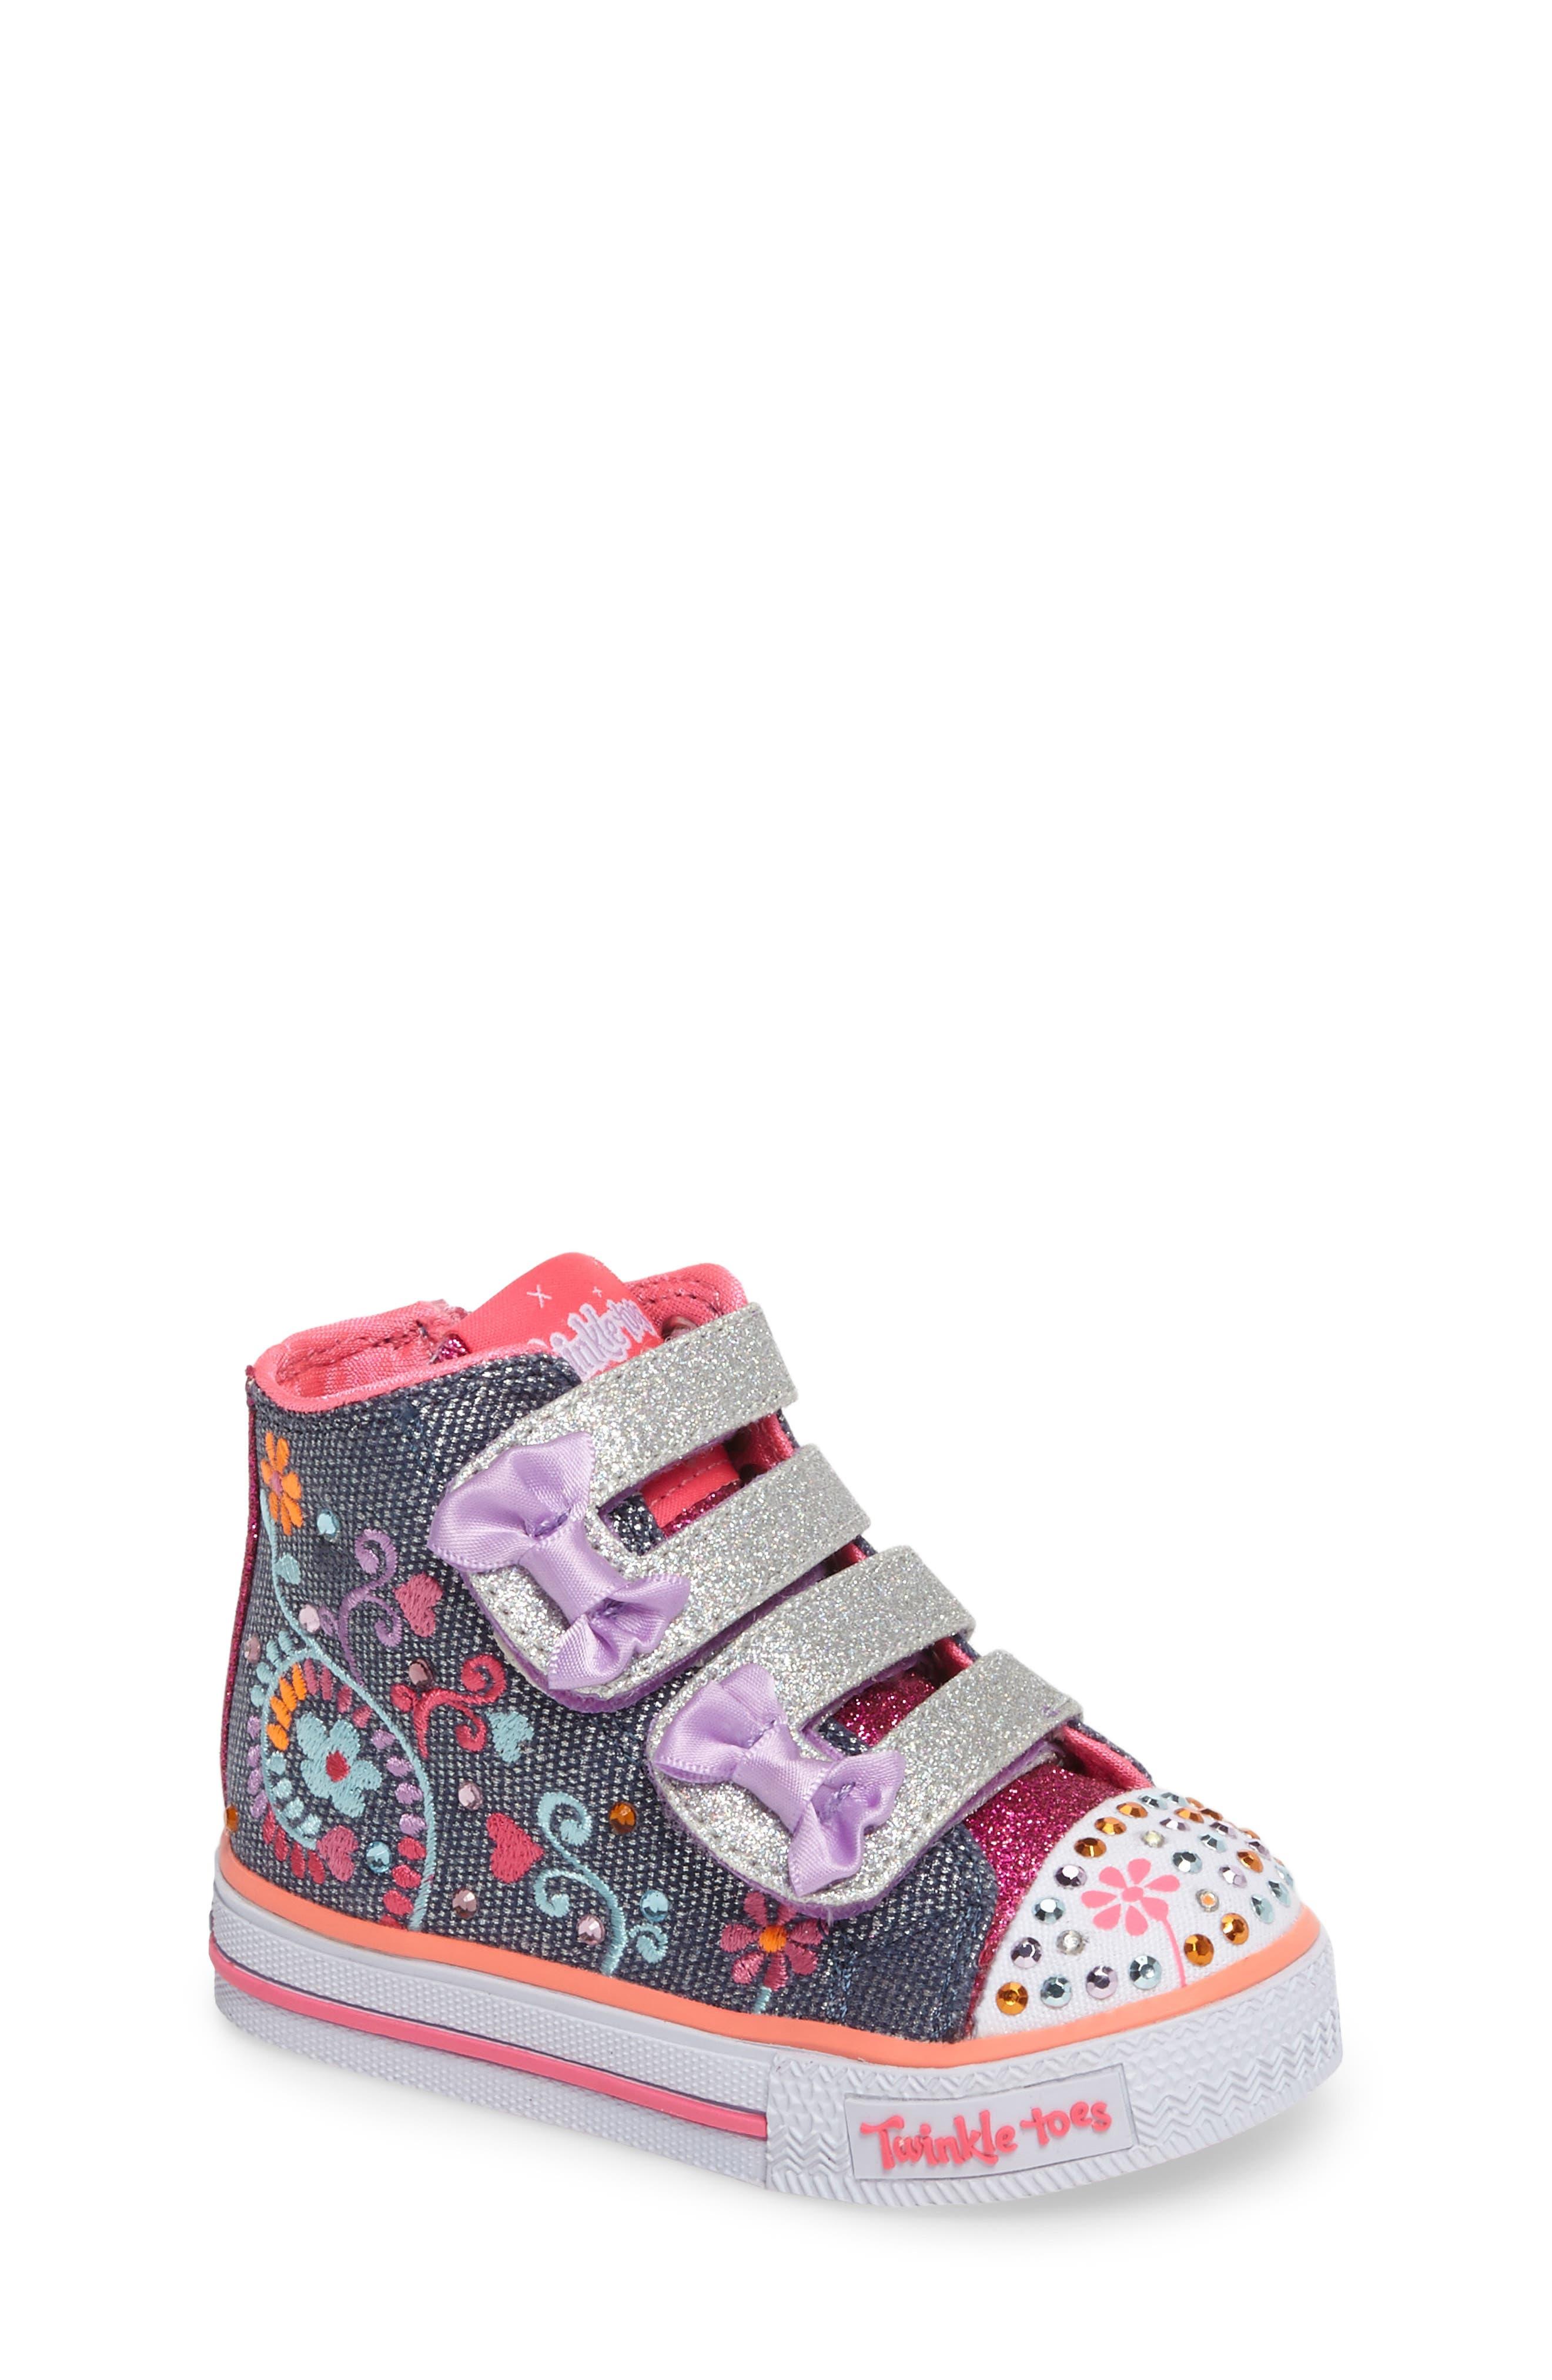 Shuffles Sneaker,                             Main thumbnail 1, color,